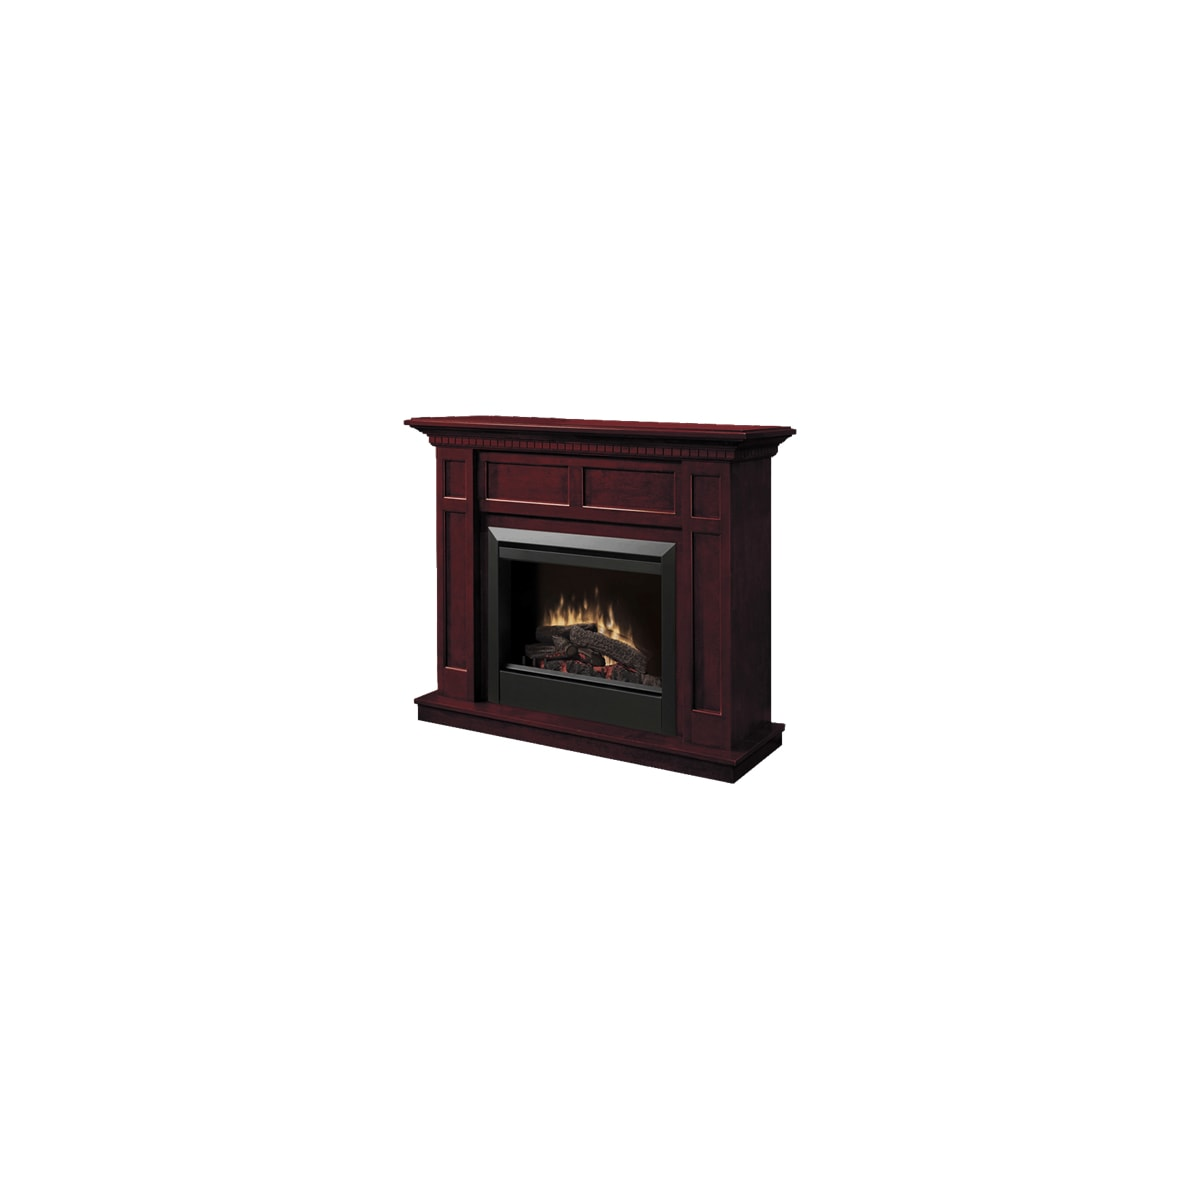 Dimplex Symphony Caprice Electric Fireplace